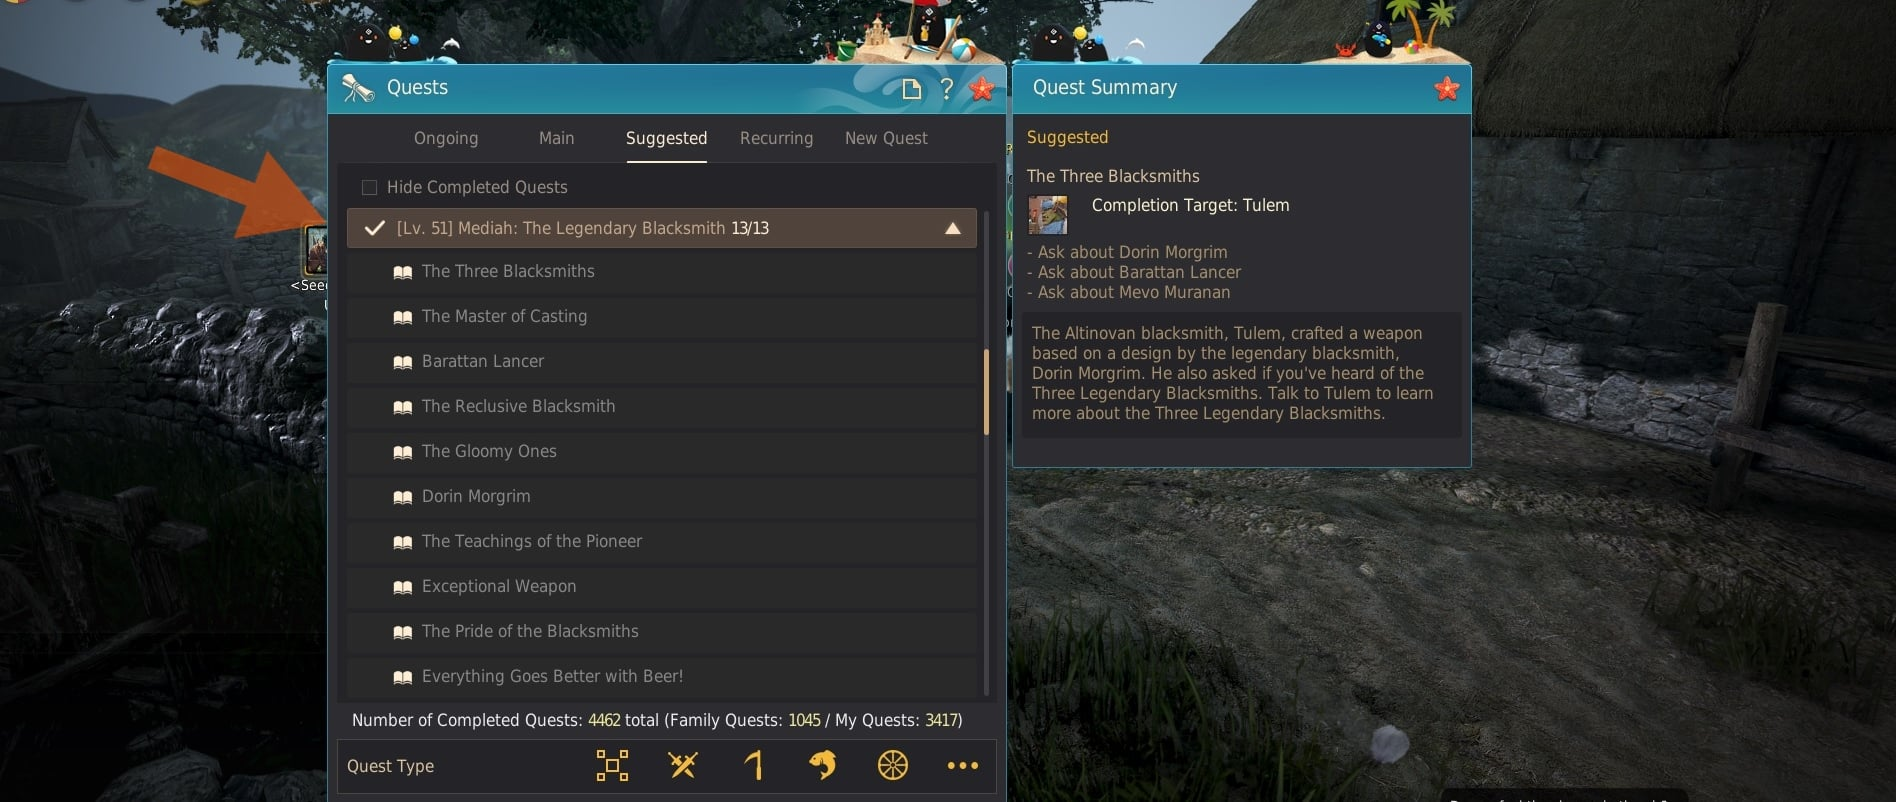 The Three Legendary Blacksmith quest at quest window